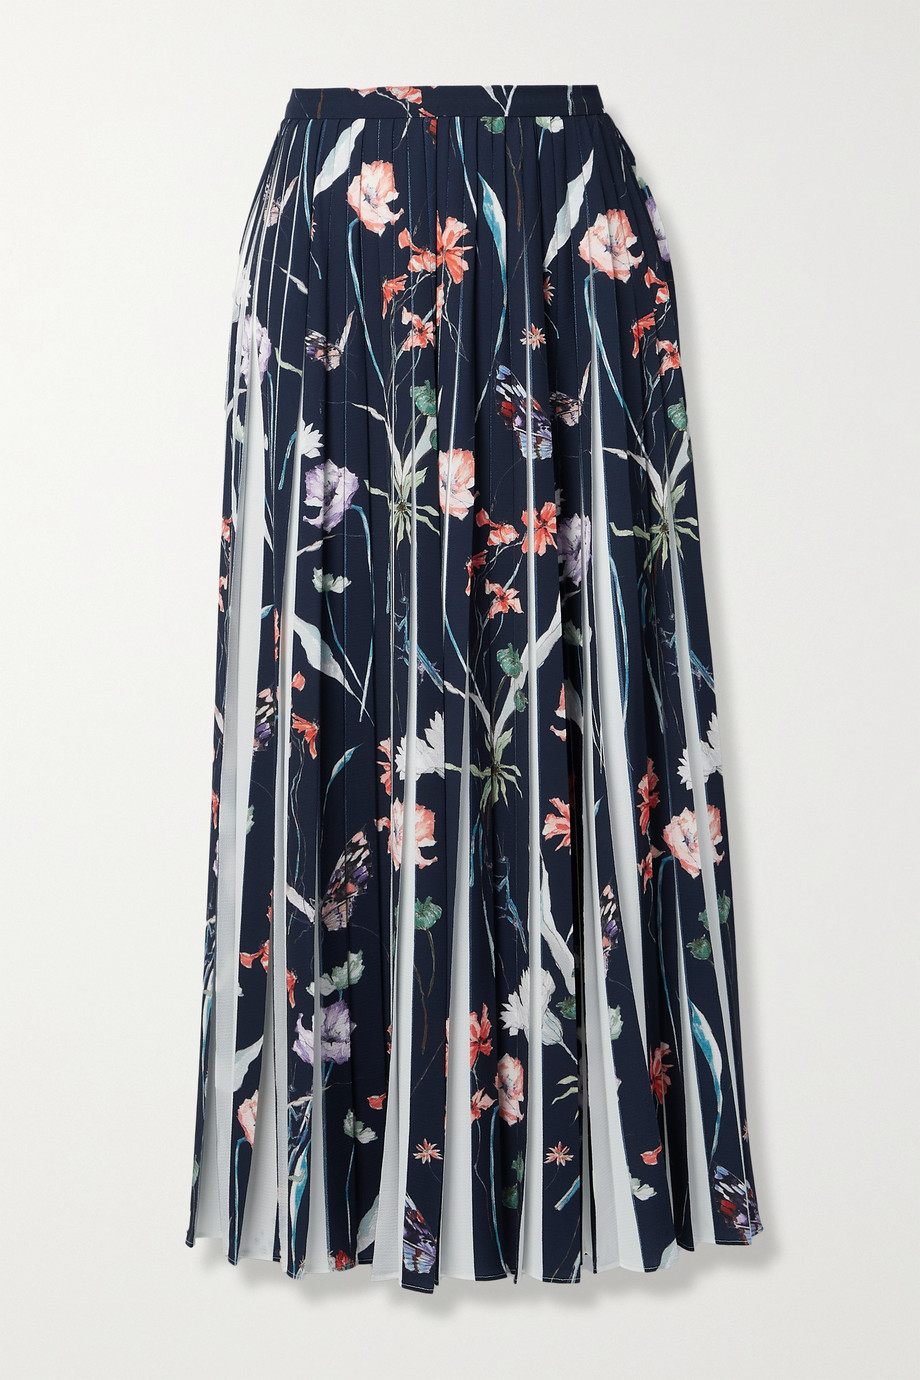 Jason Wu Collection Pleated floral-print crepe midi skirt